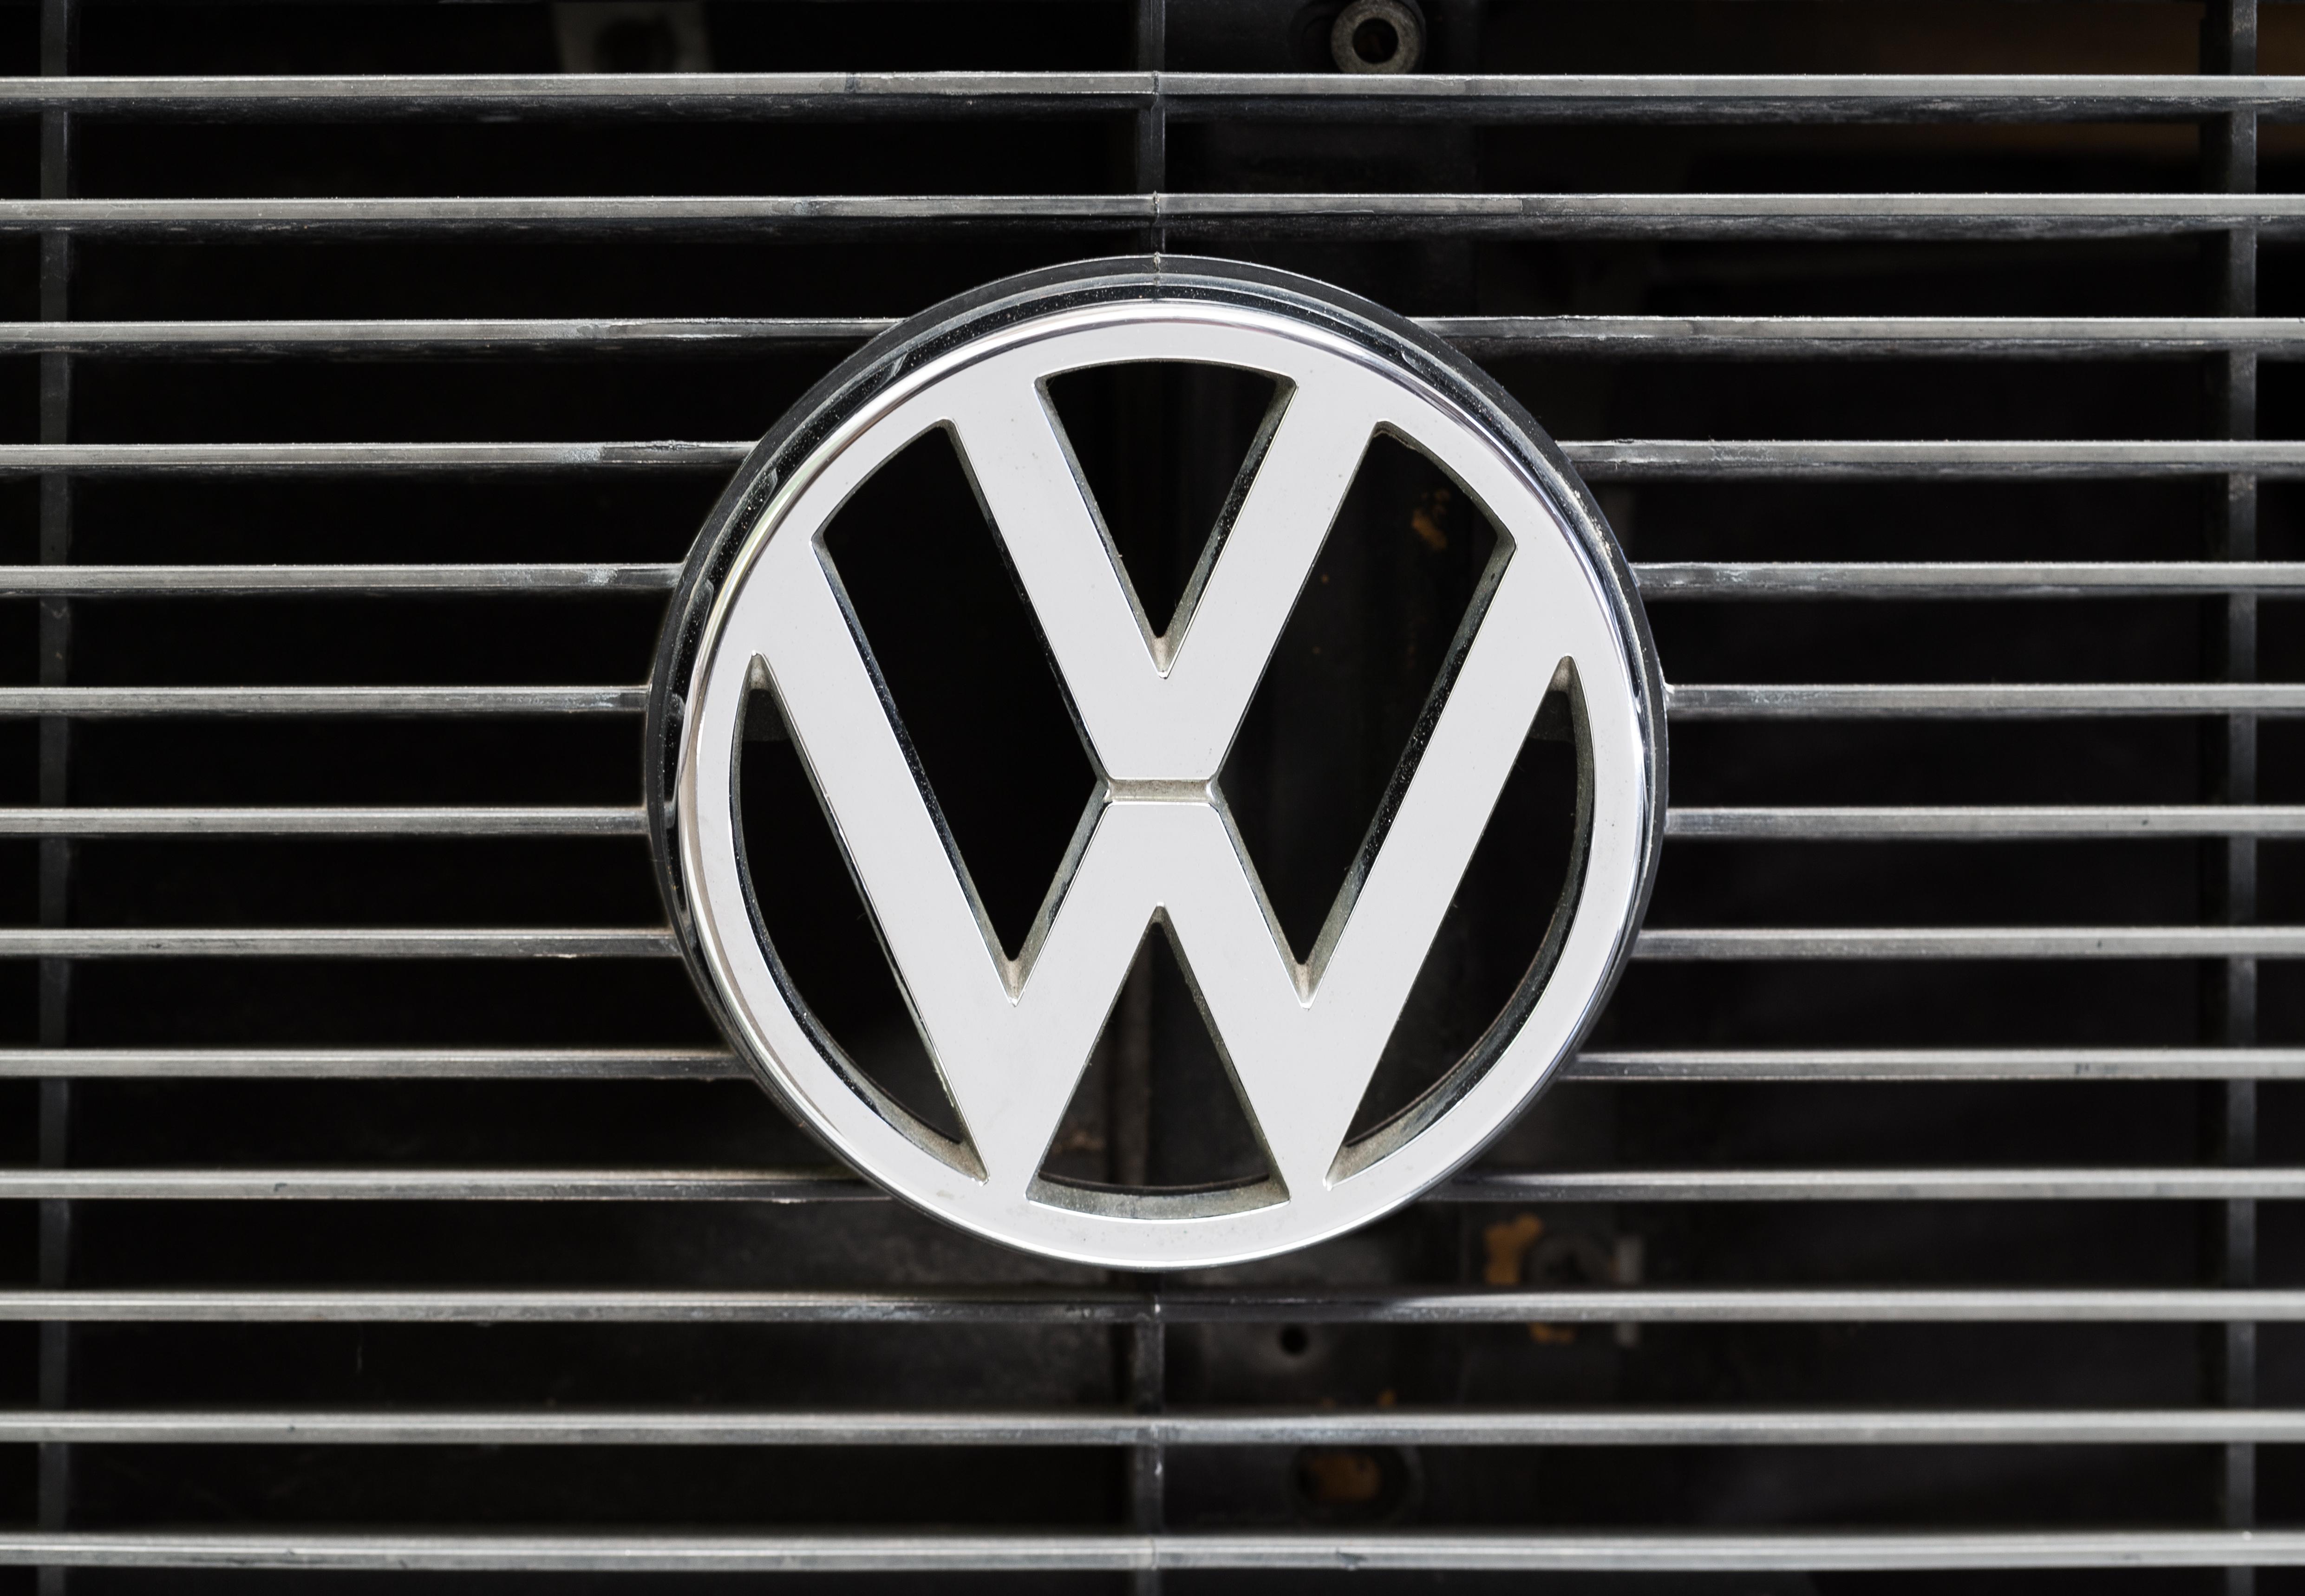 Used Volkswagen Passat >> File:VW Logo, Volkswagen Passat B1, SahiFa Braunschweig, AP3Q0119 edit.jpg - Wikimedia Commons